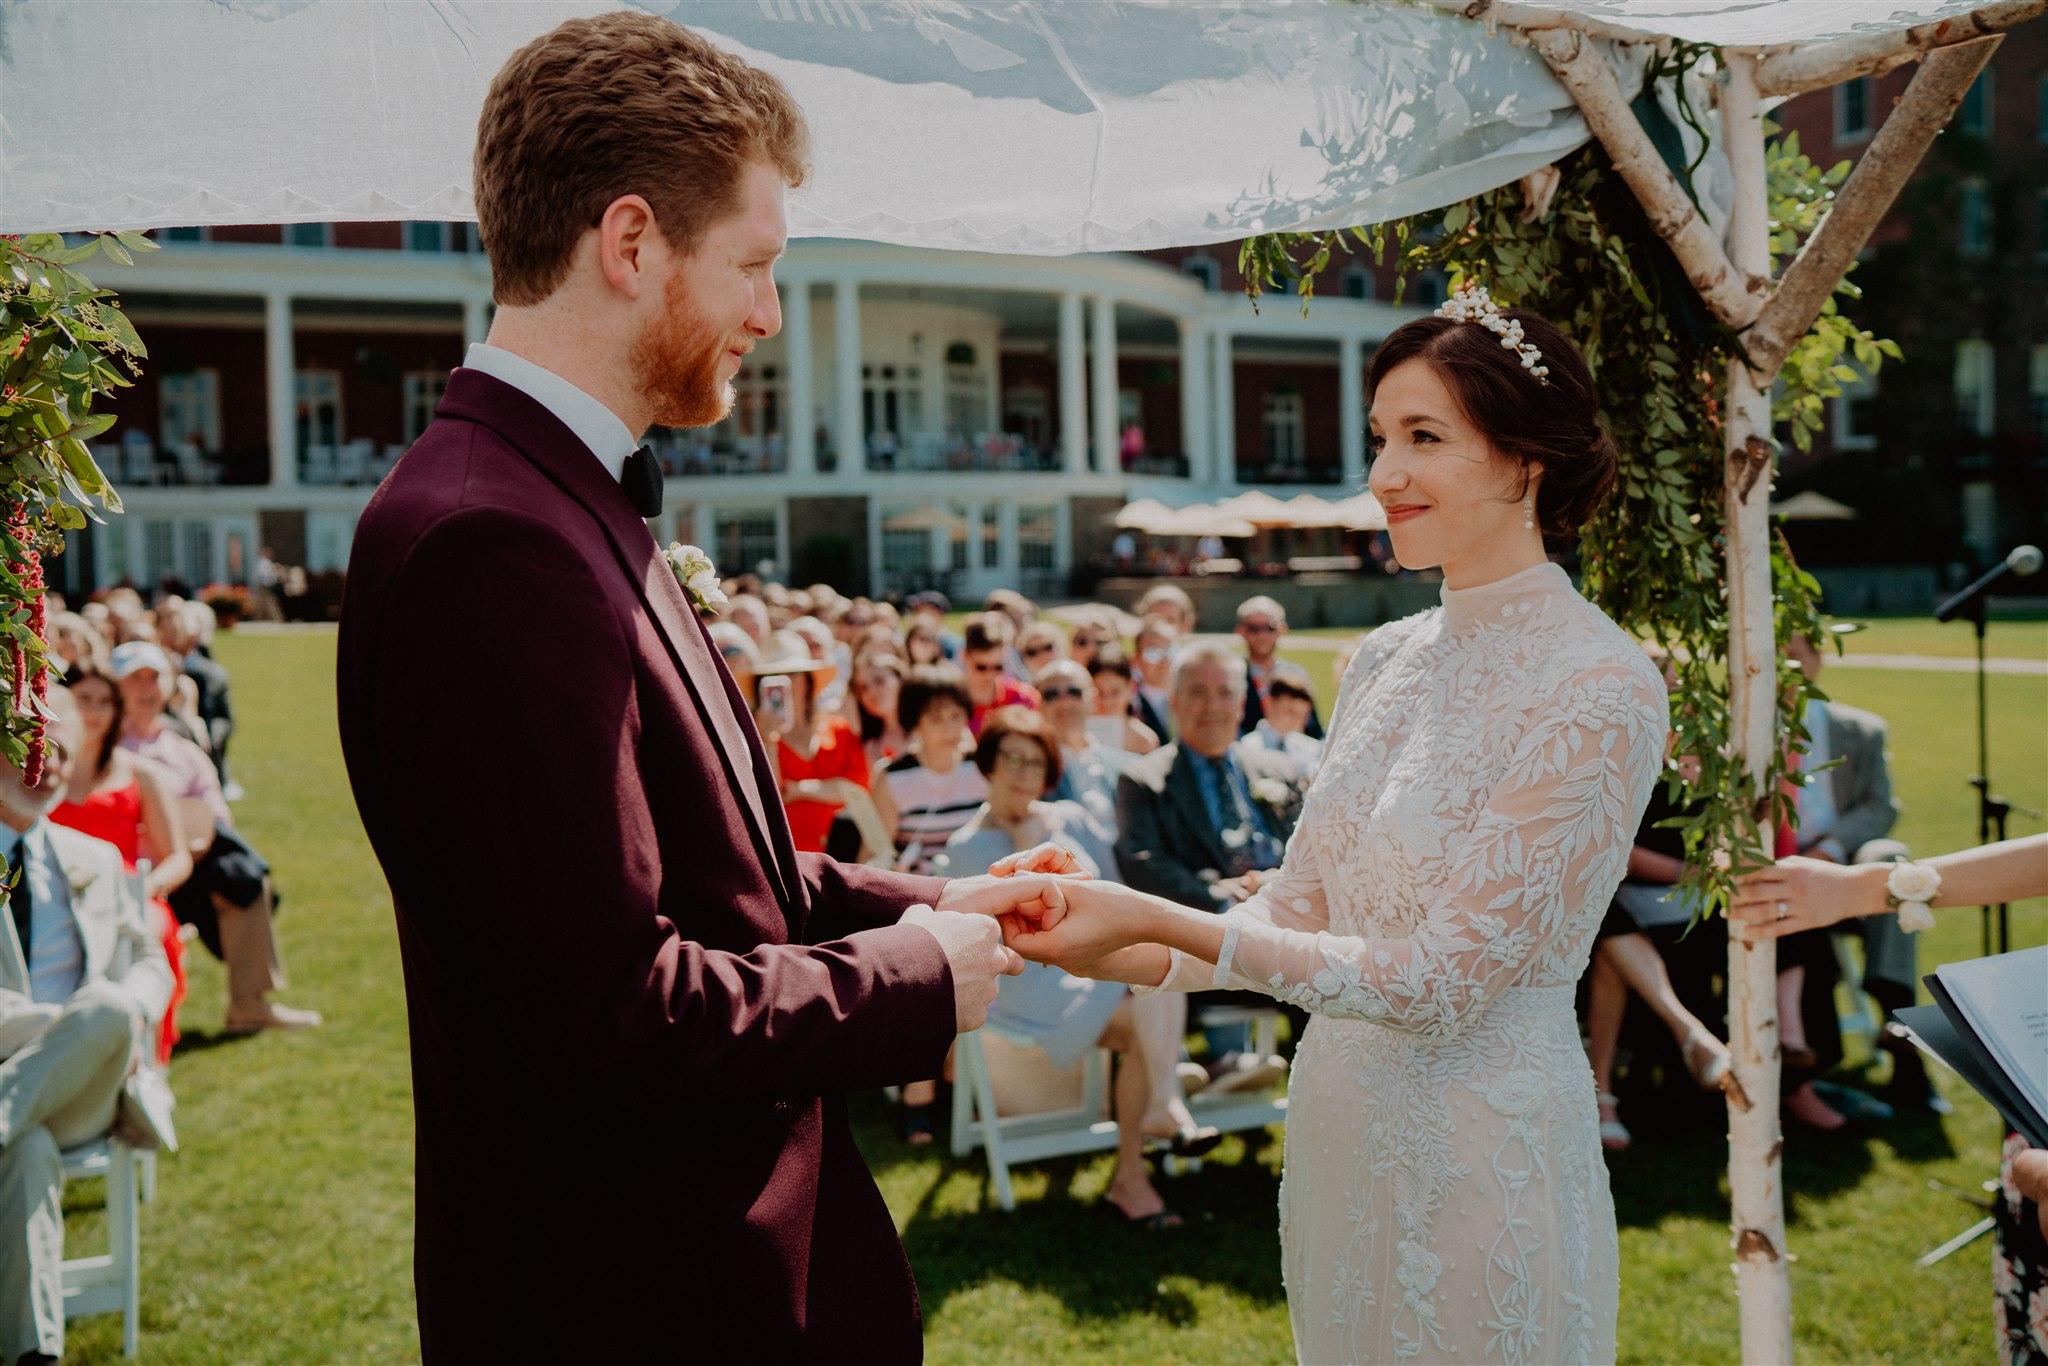 Chellise_Michael_Photography_Hudson_Valley_Wedding_Photographer_Otesaga_Hotel-3129.jpg